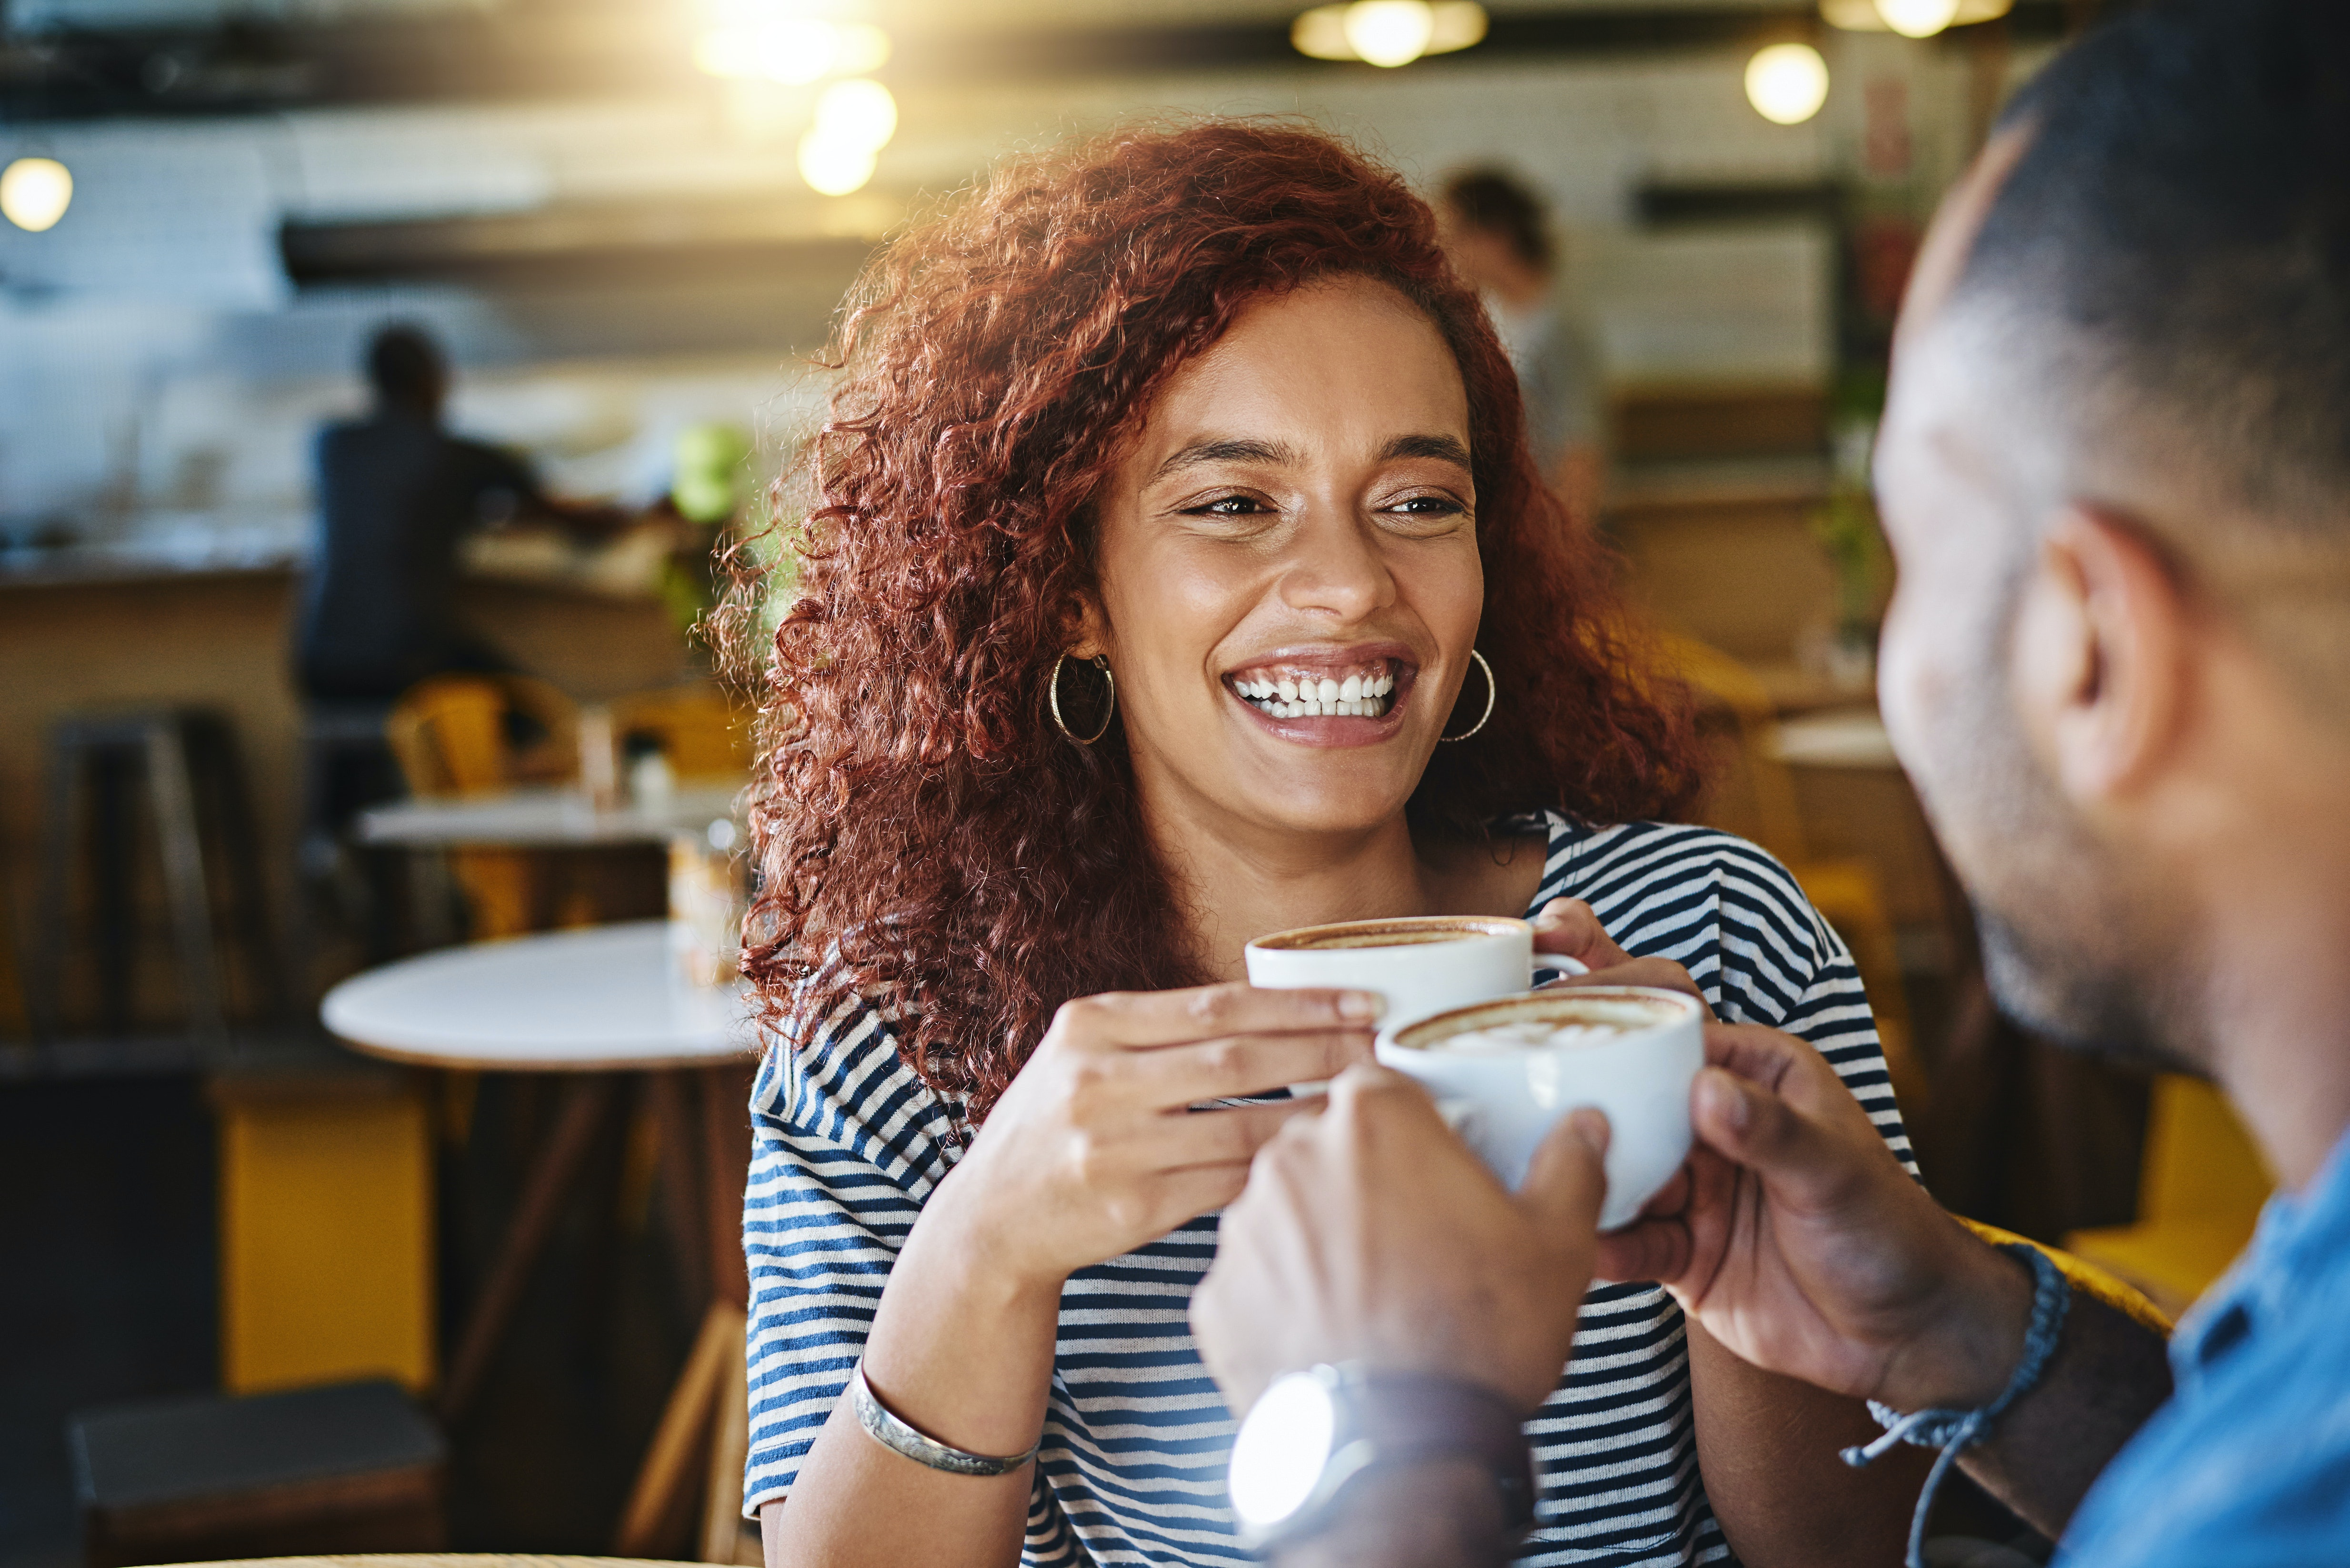 Hoe om te weten wanneer te beginnen dating again